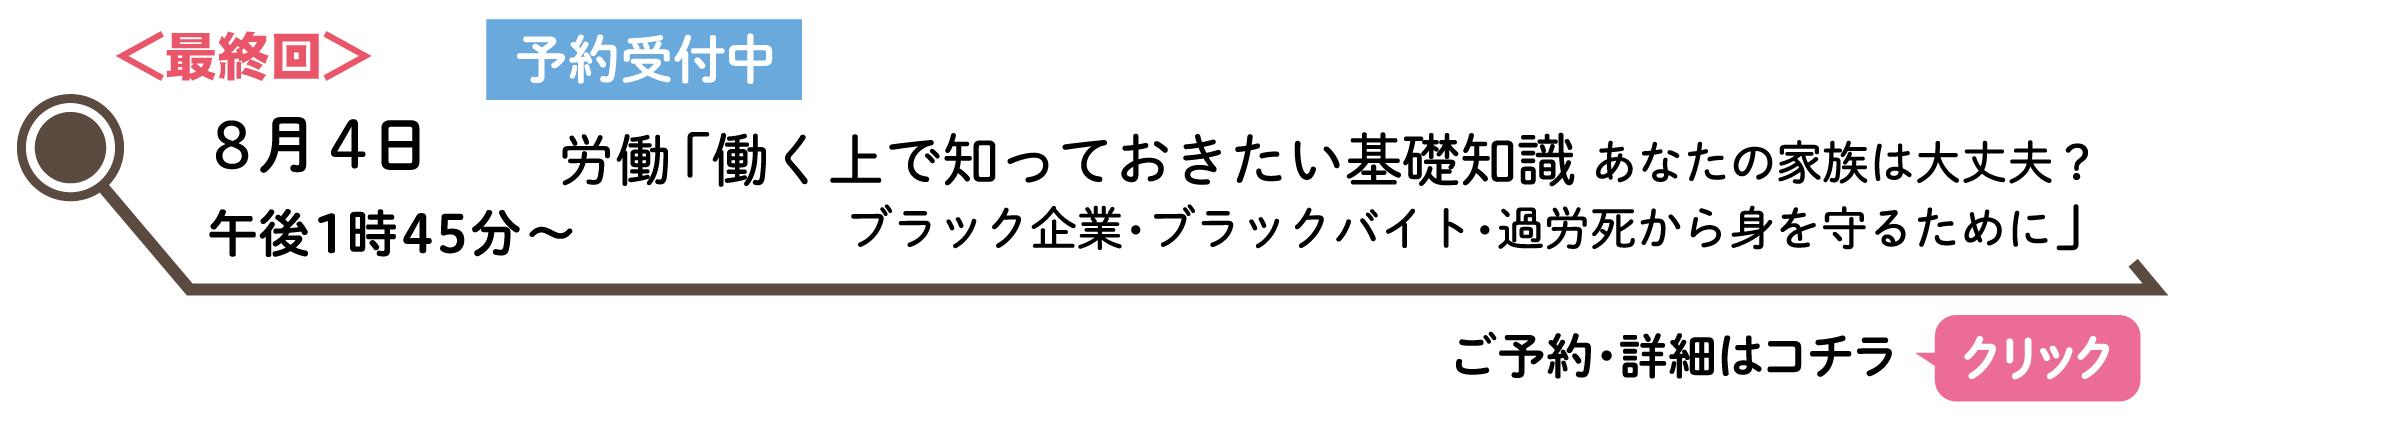 2018_8gatu